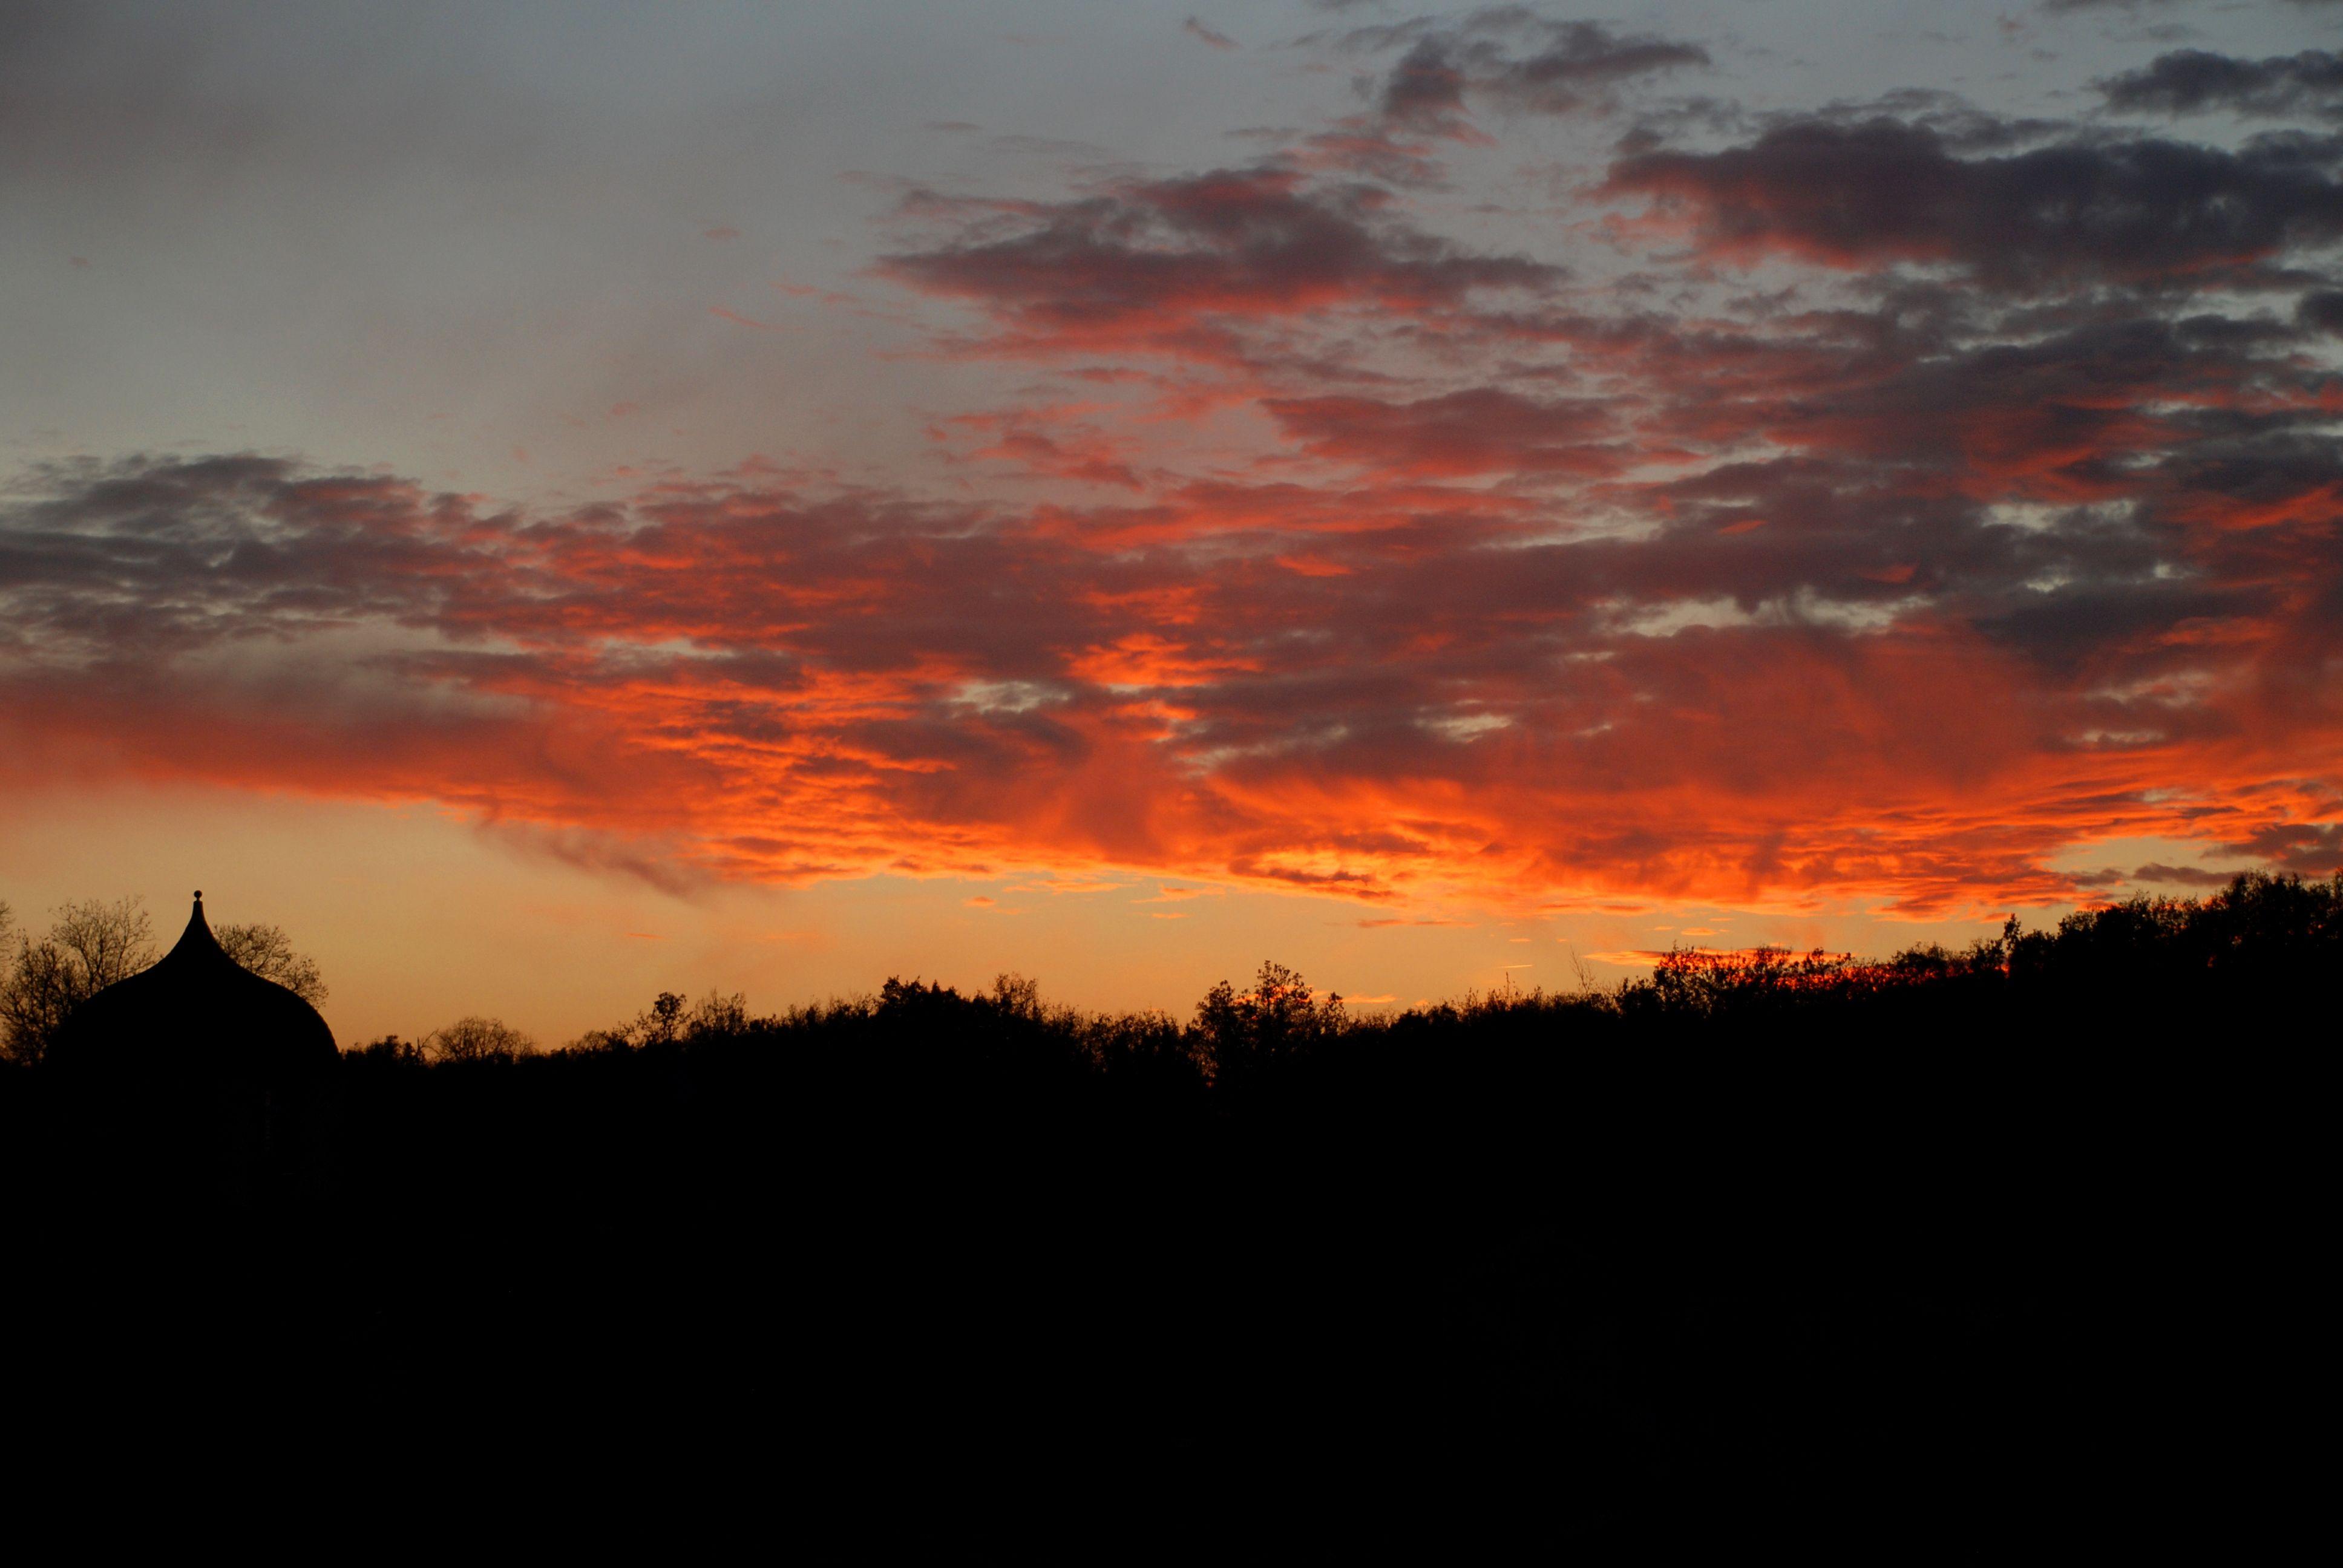 #chateaudelarochecourbon #larochecourbon #chateau #castle #charentemaritime #igerscharentemaritime #sunset #saintonge